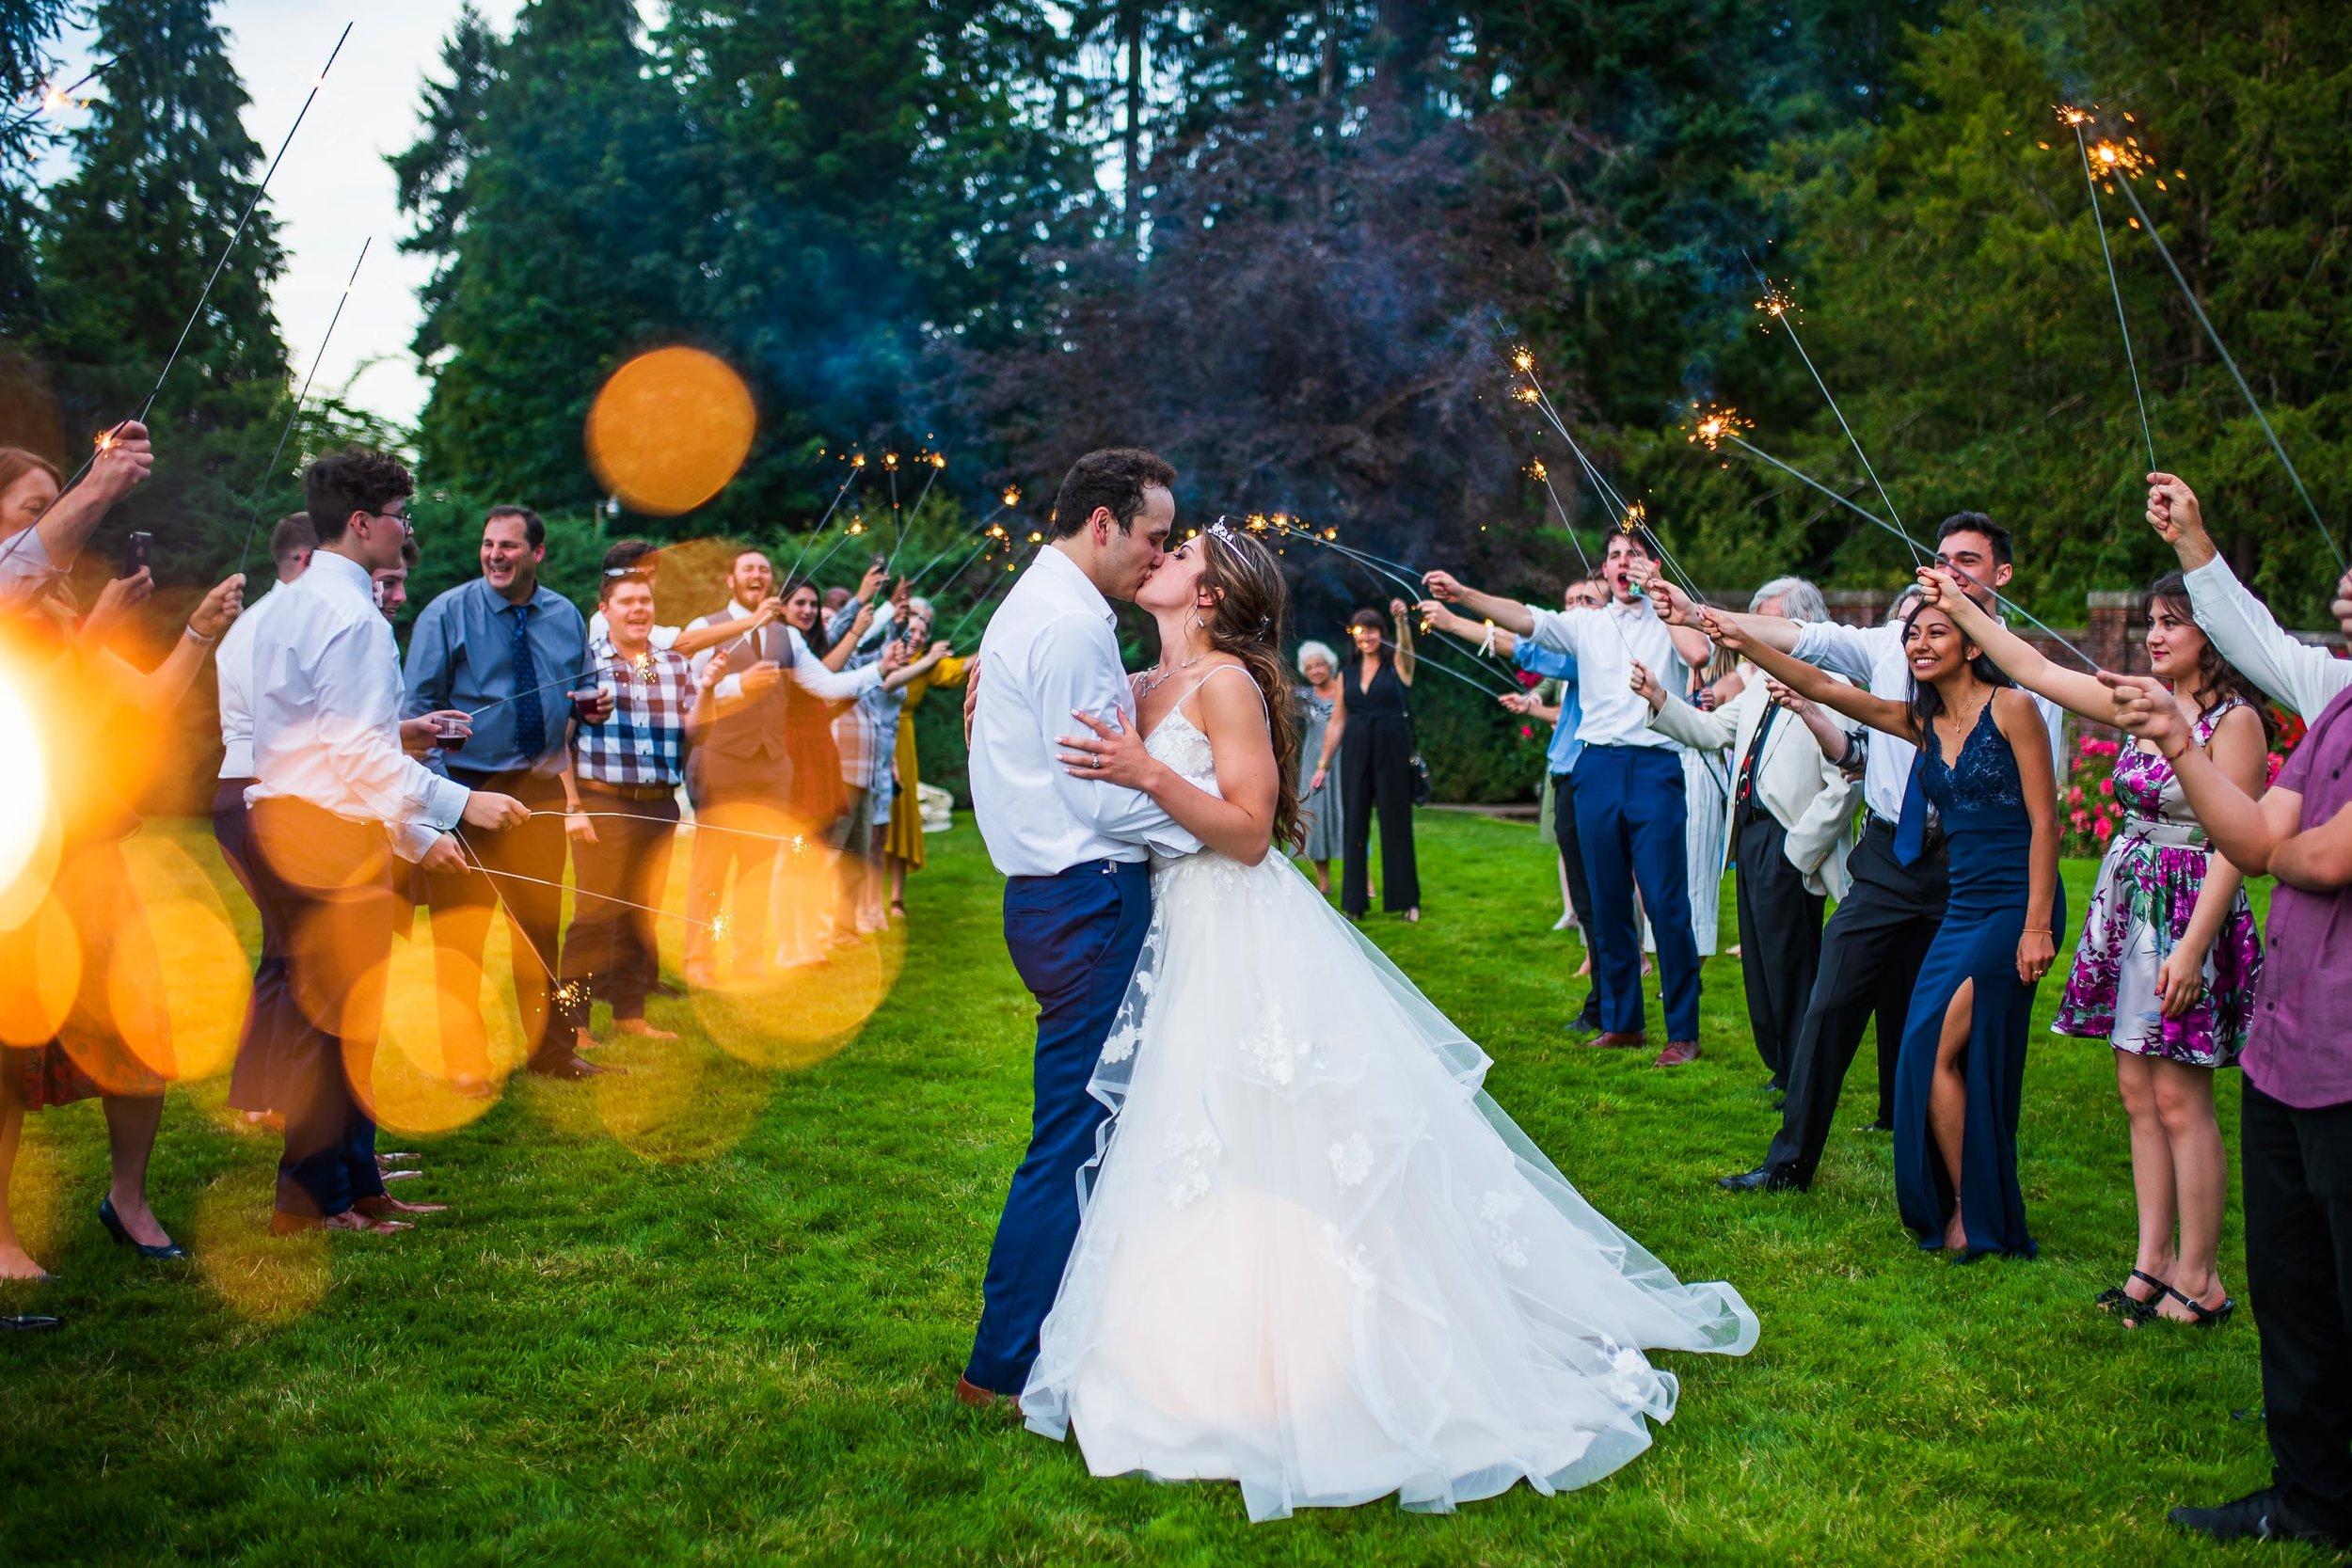 thornewood castle wedding 94.jpg